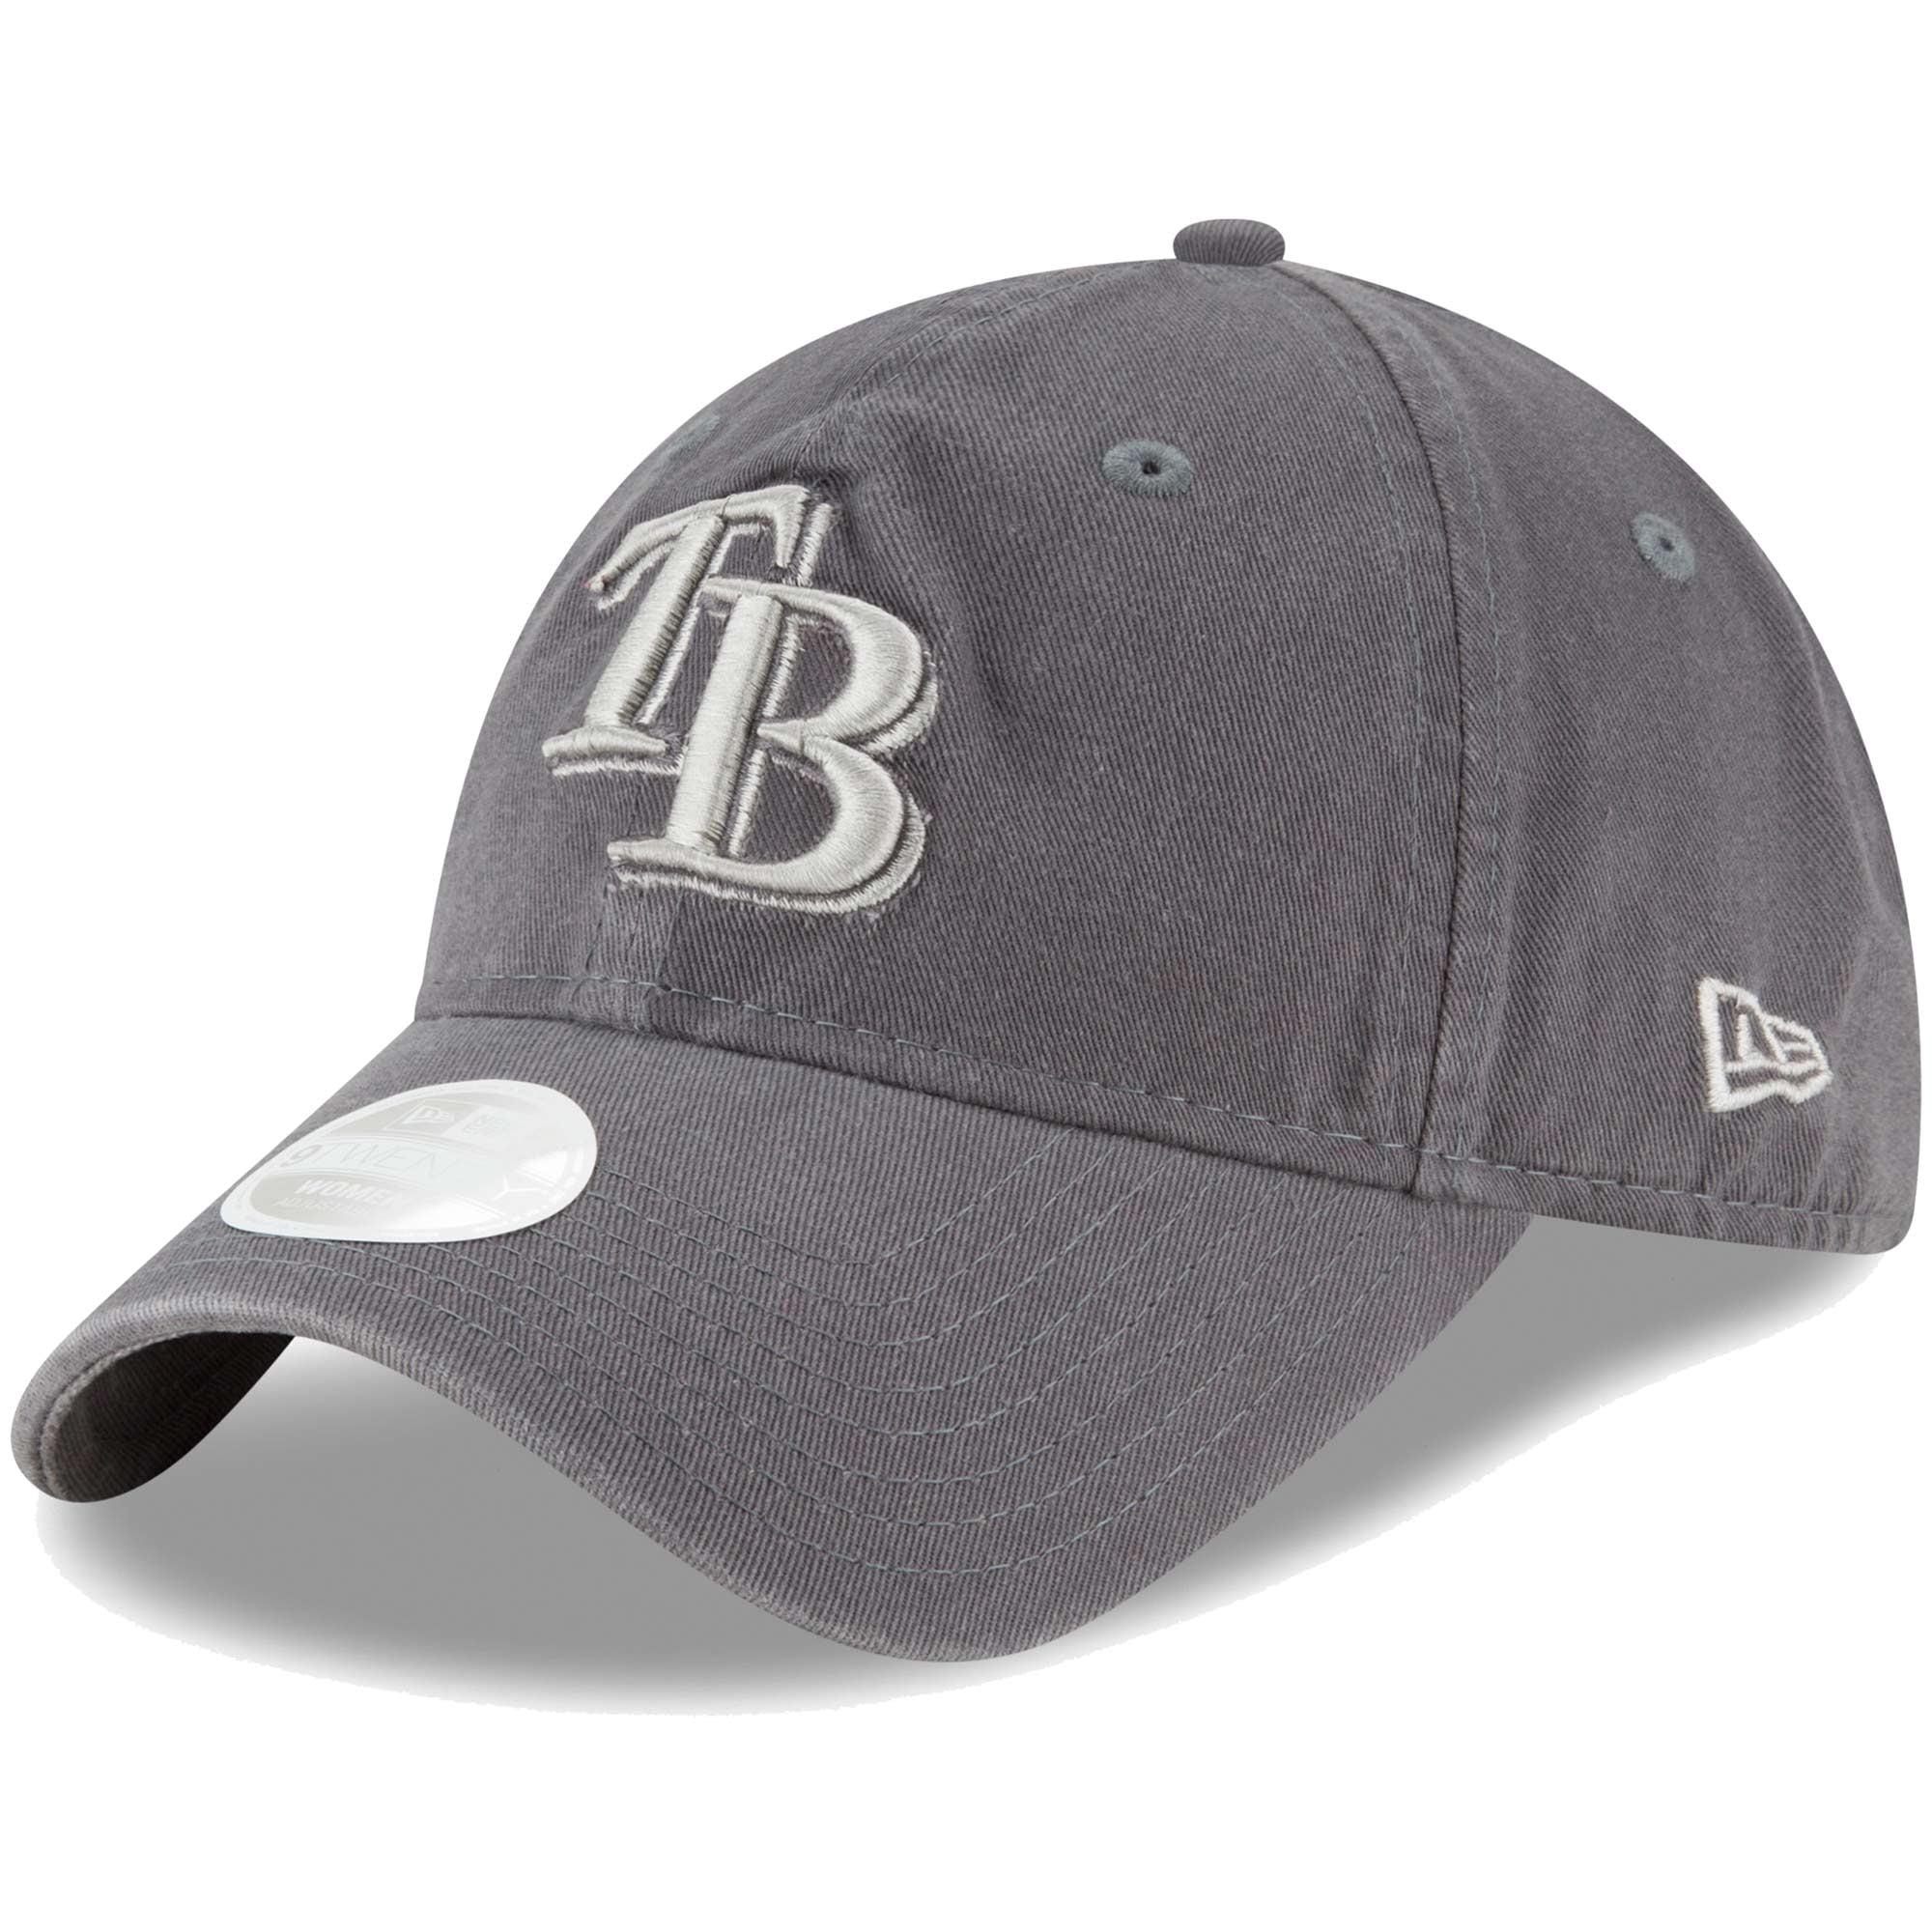 Tampa Bay Rays New Era Women's Preferred Pick 9TWENTY Adjustable Hat - Graphite - OSFA